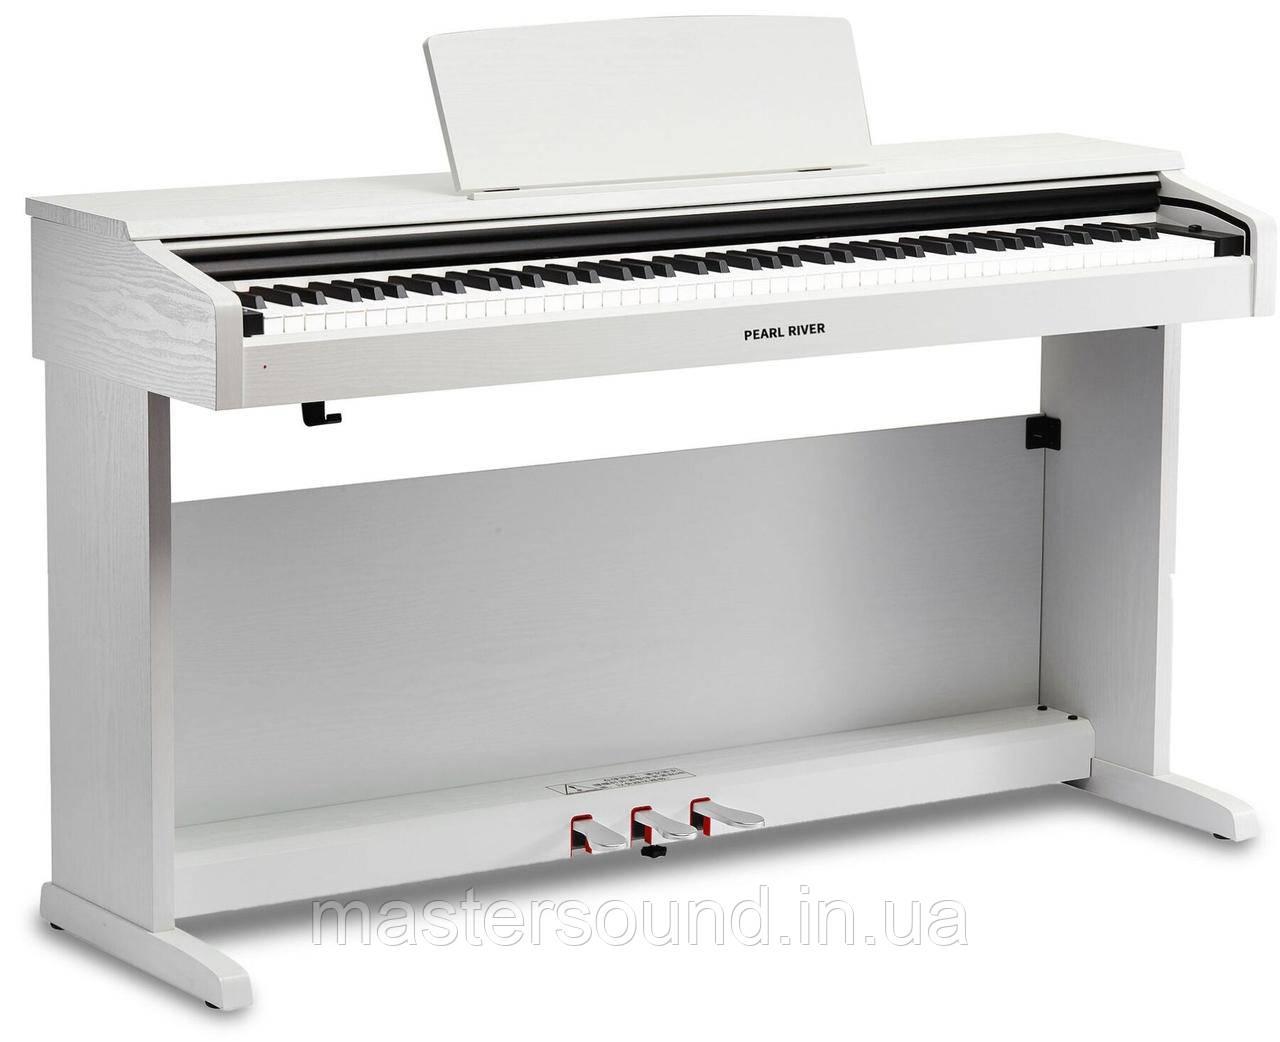 Цифровое пианино Pearl River V-03 WH